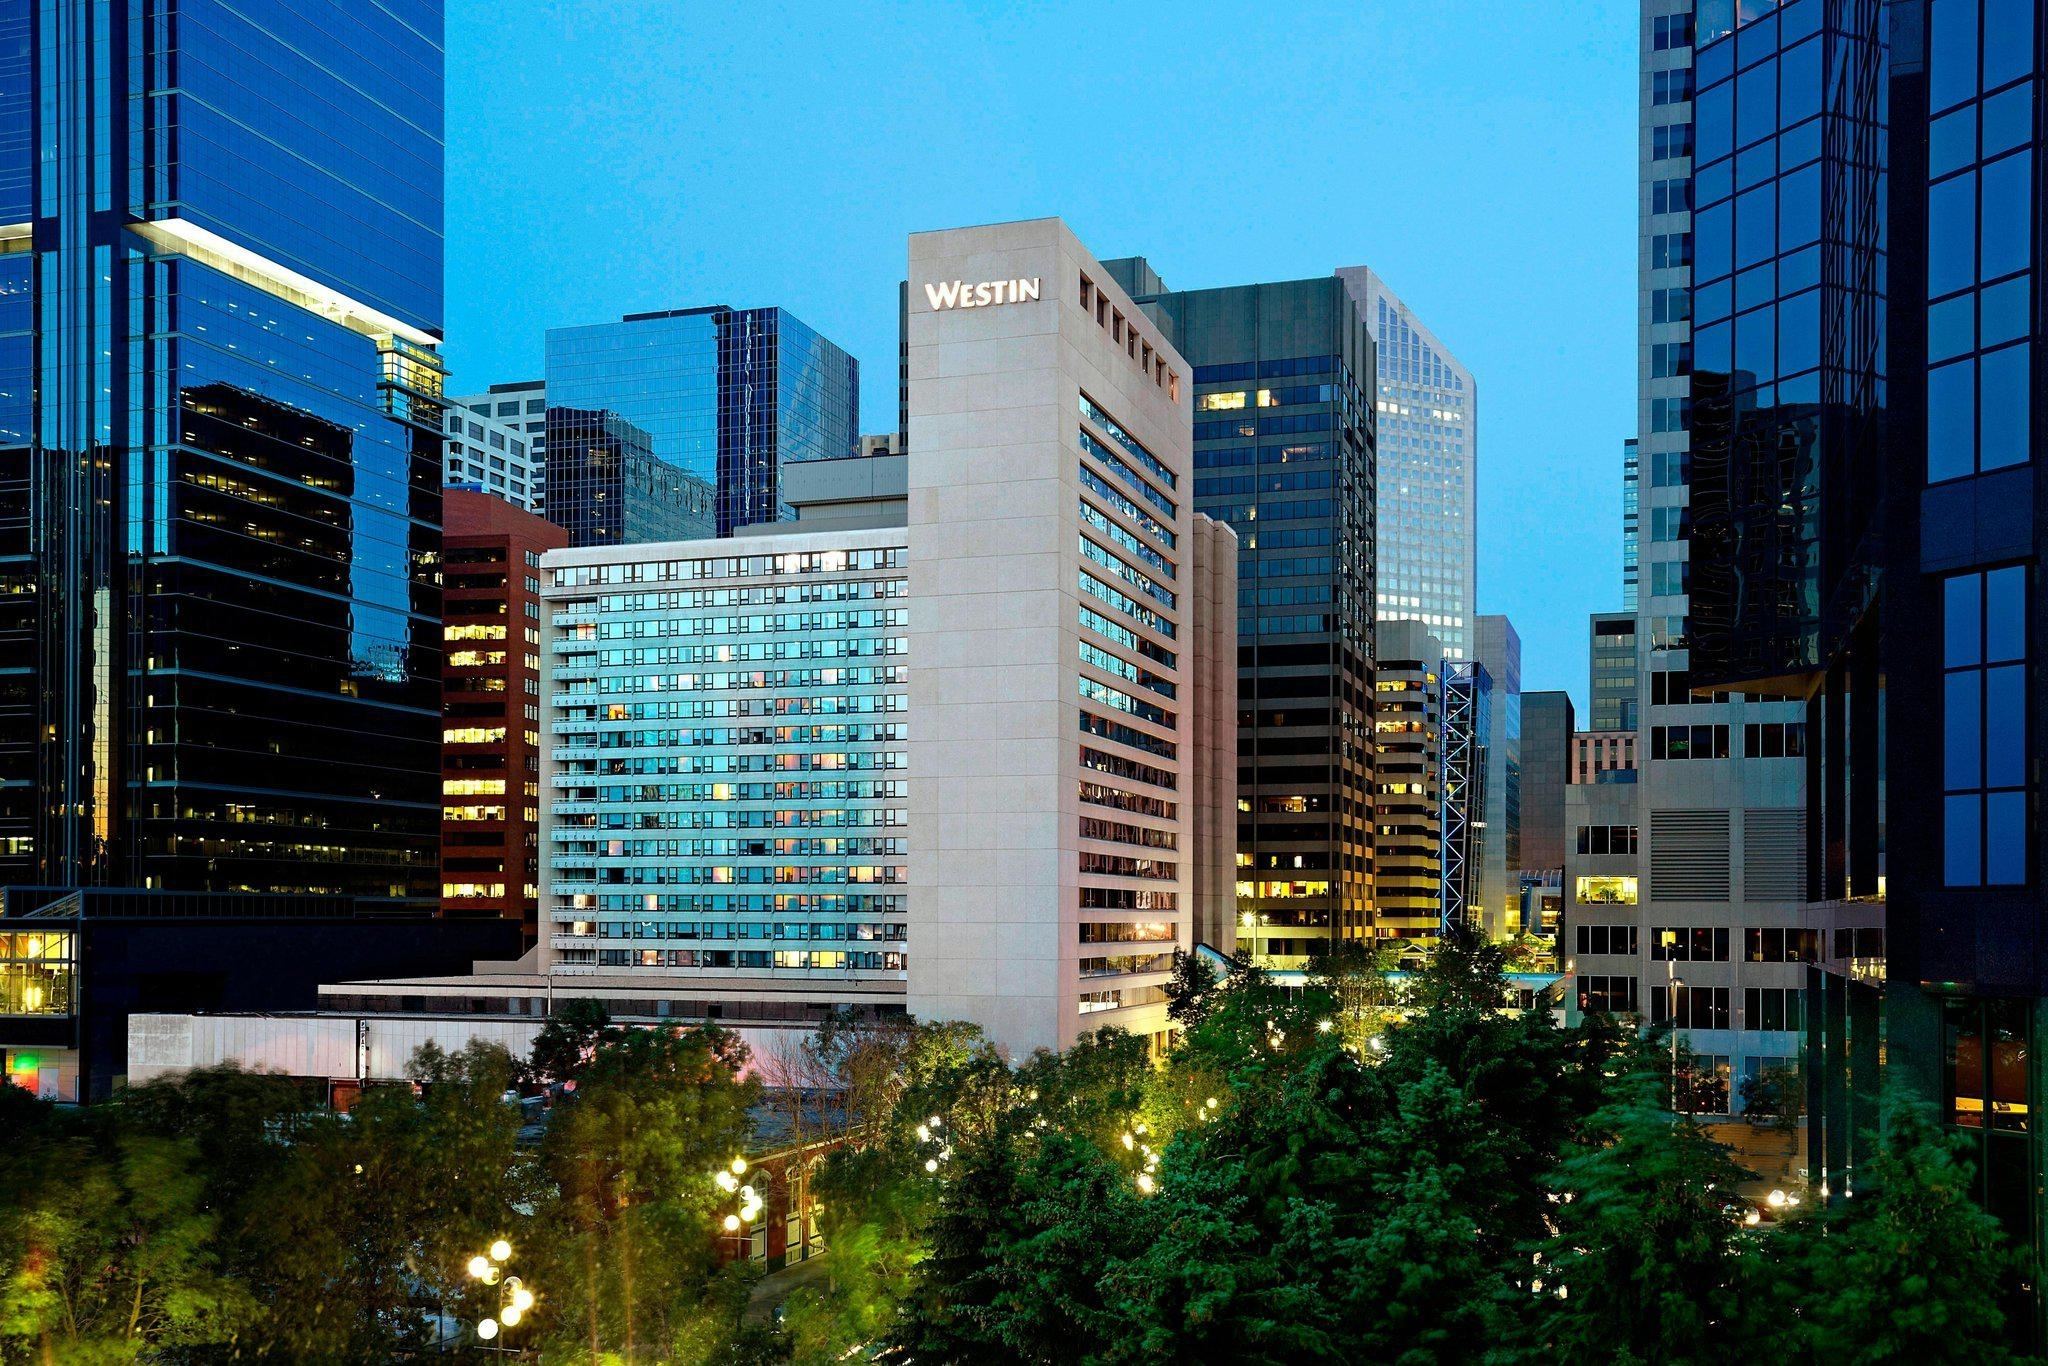 The Westin Calgary - Hotels